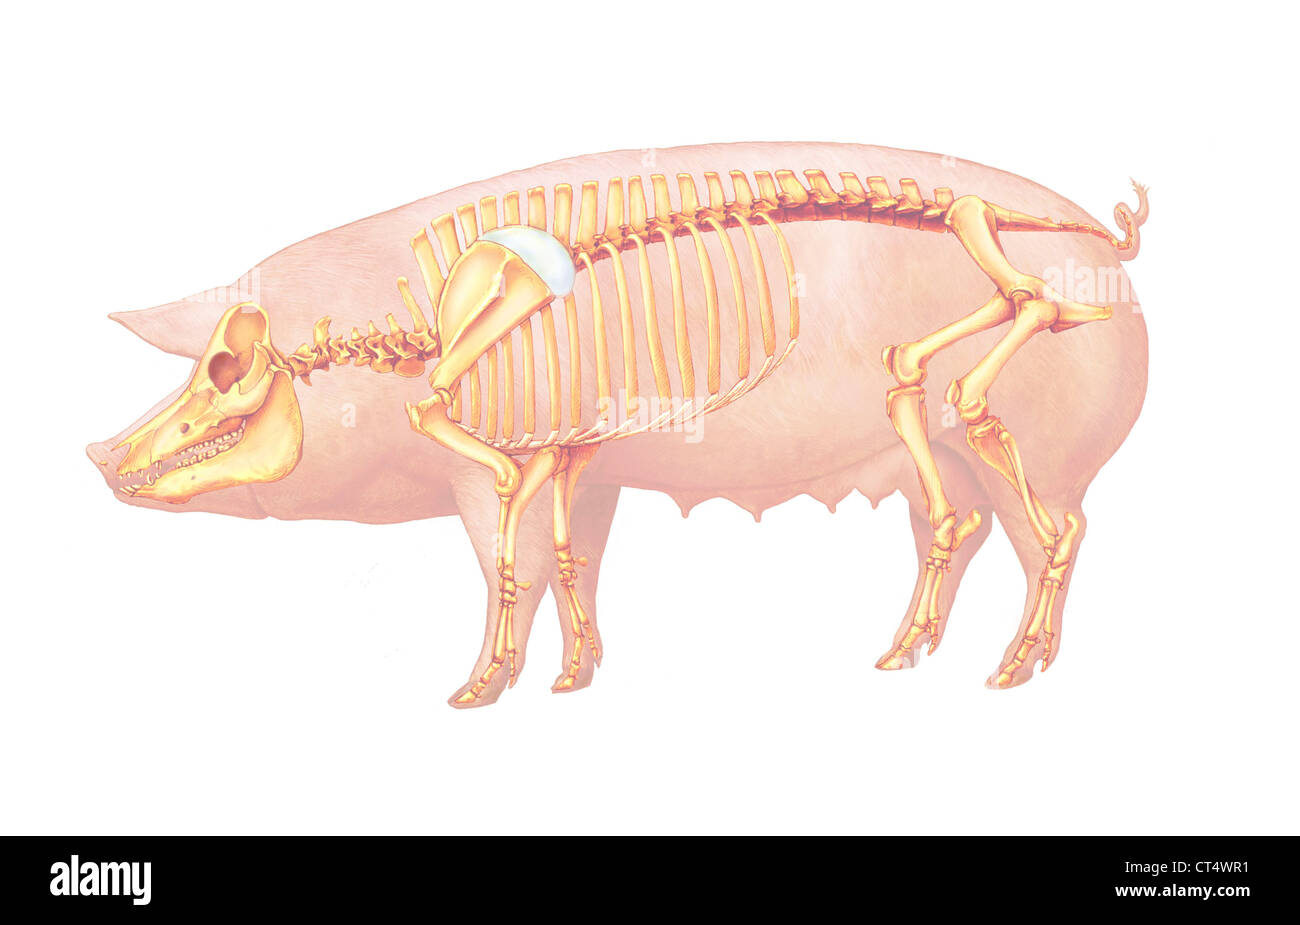 PIG ANATOMY, DRAWING Stock Photo: 49280533 - Alamy